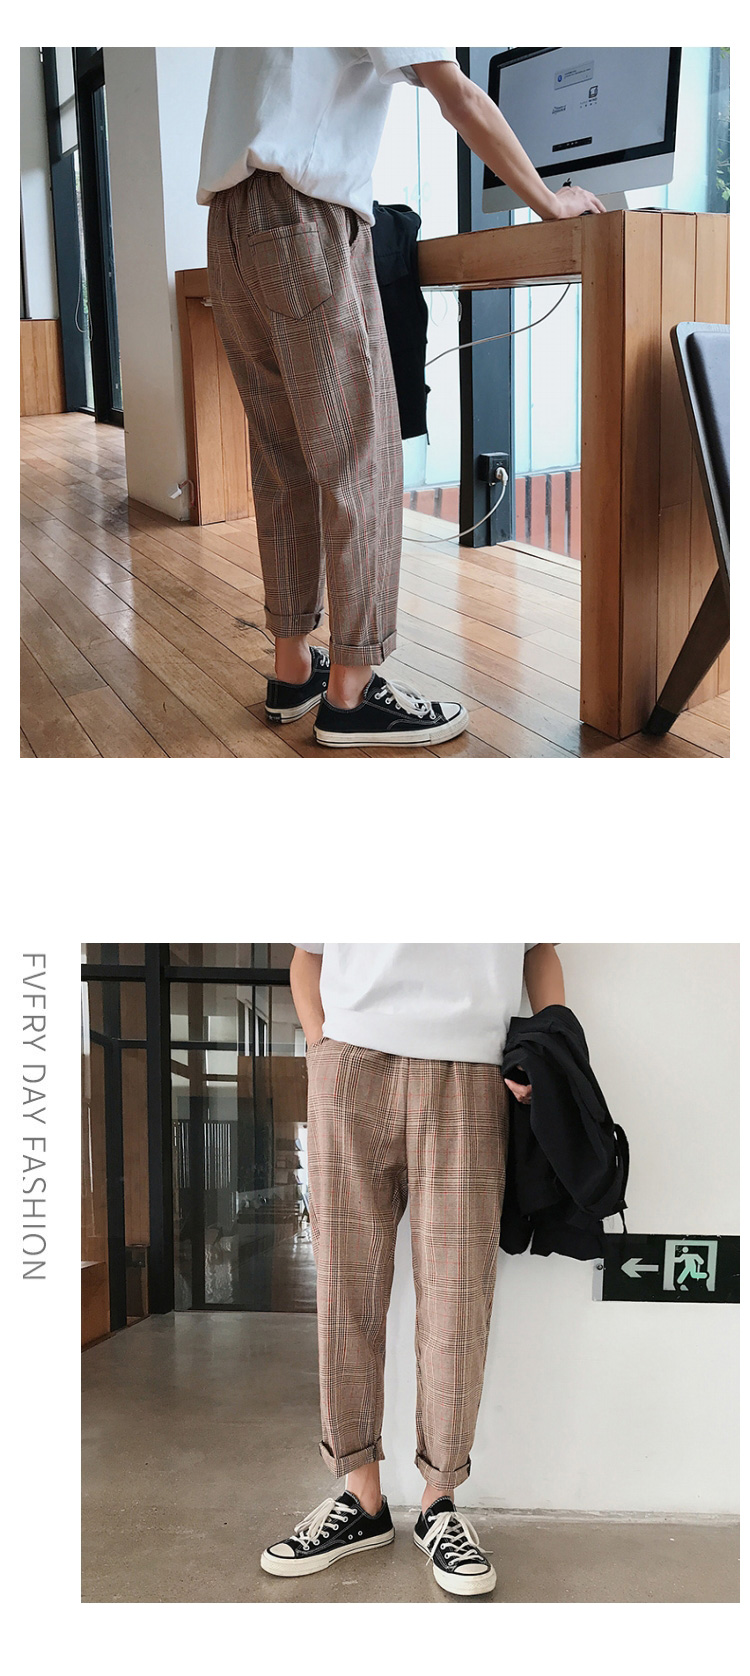 HTB1pzOvbsnrK1RjSspkq6yuvXXaY LAPPSTER Streetwear Yellow Plaid Pants Men Joggers 2019 Man Casual Straight Harem Pants Men Korean Hip Hop Track Pants Plus Size